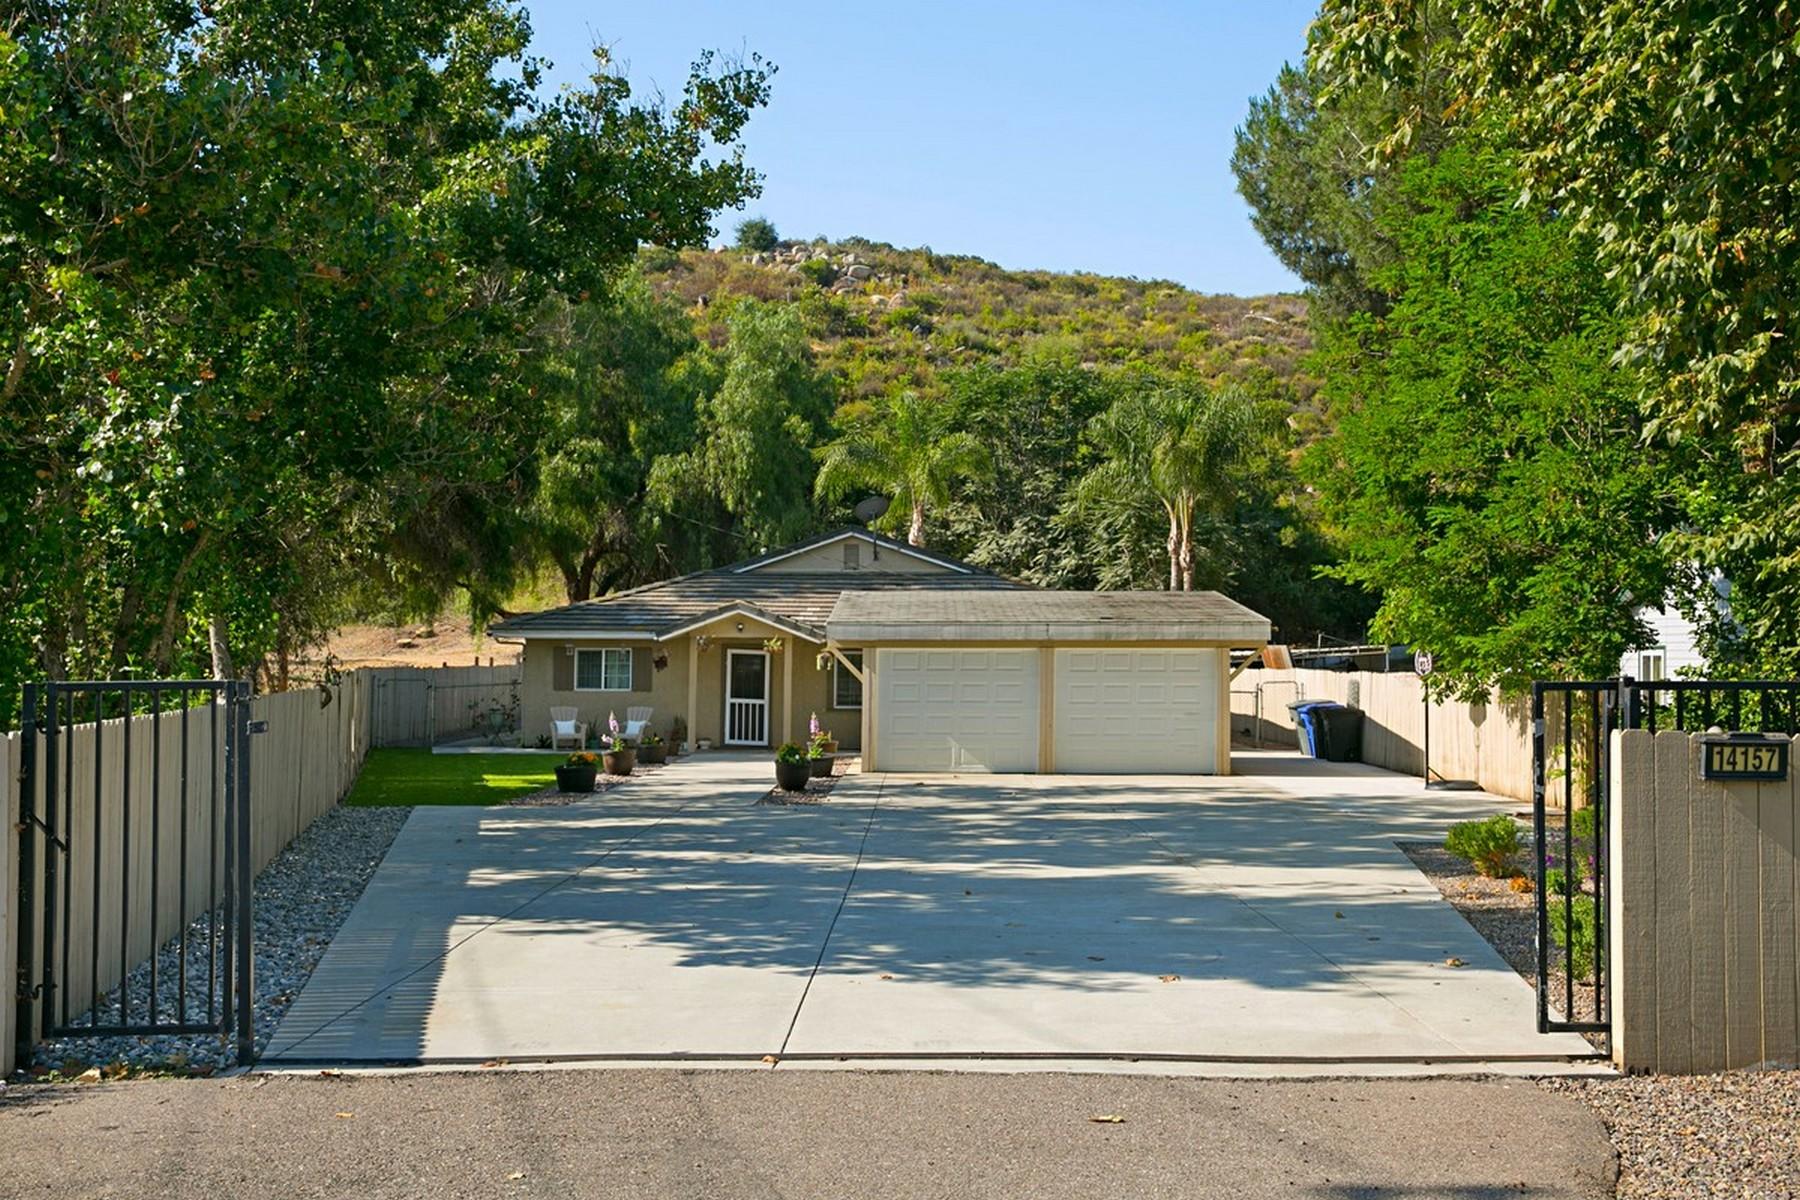 Single Family Home for Sale at 14157 Ezra Lane Poway, California, 92064 United States